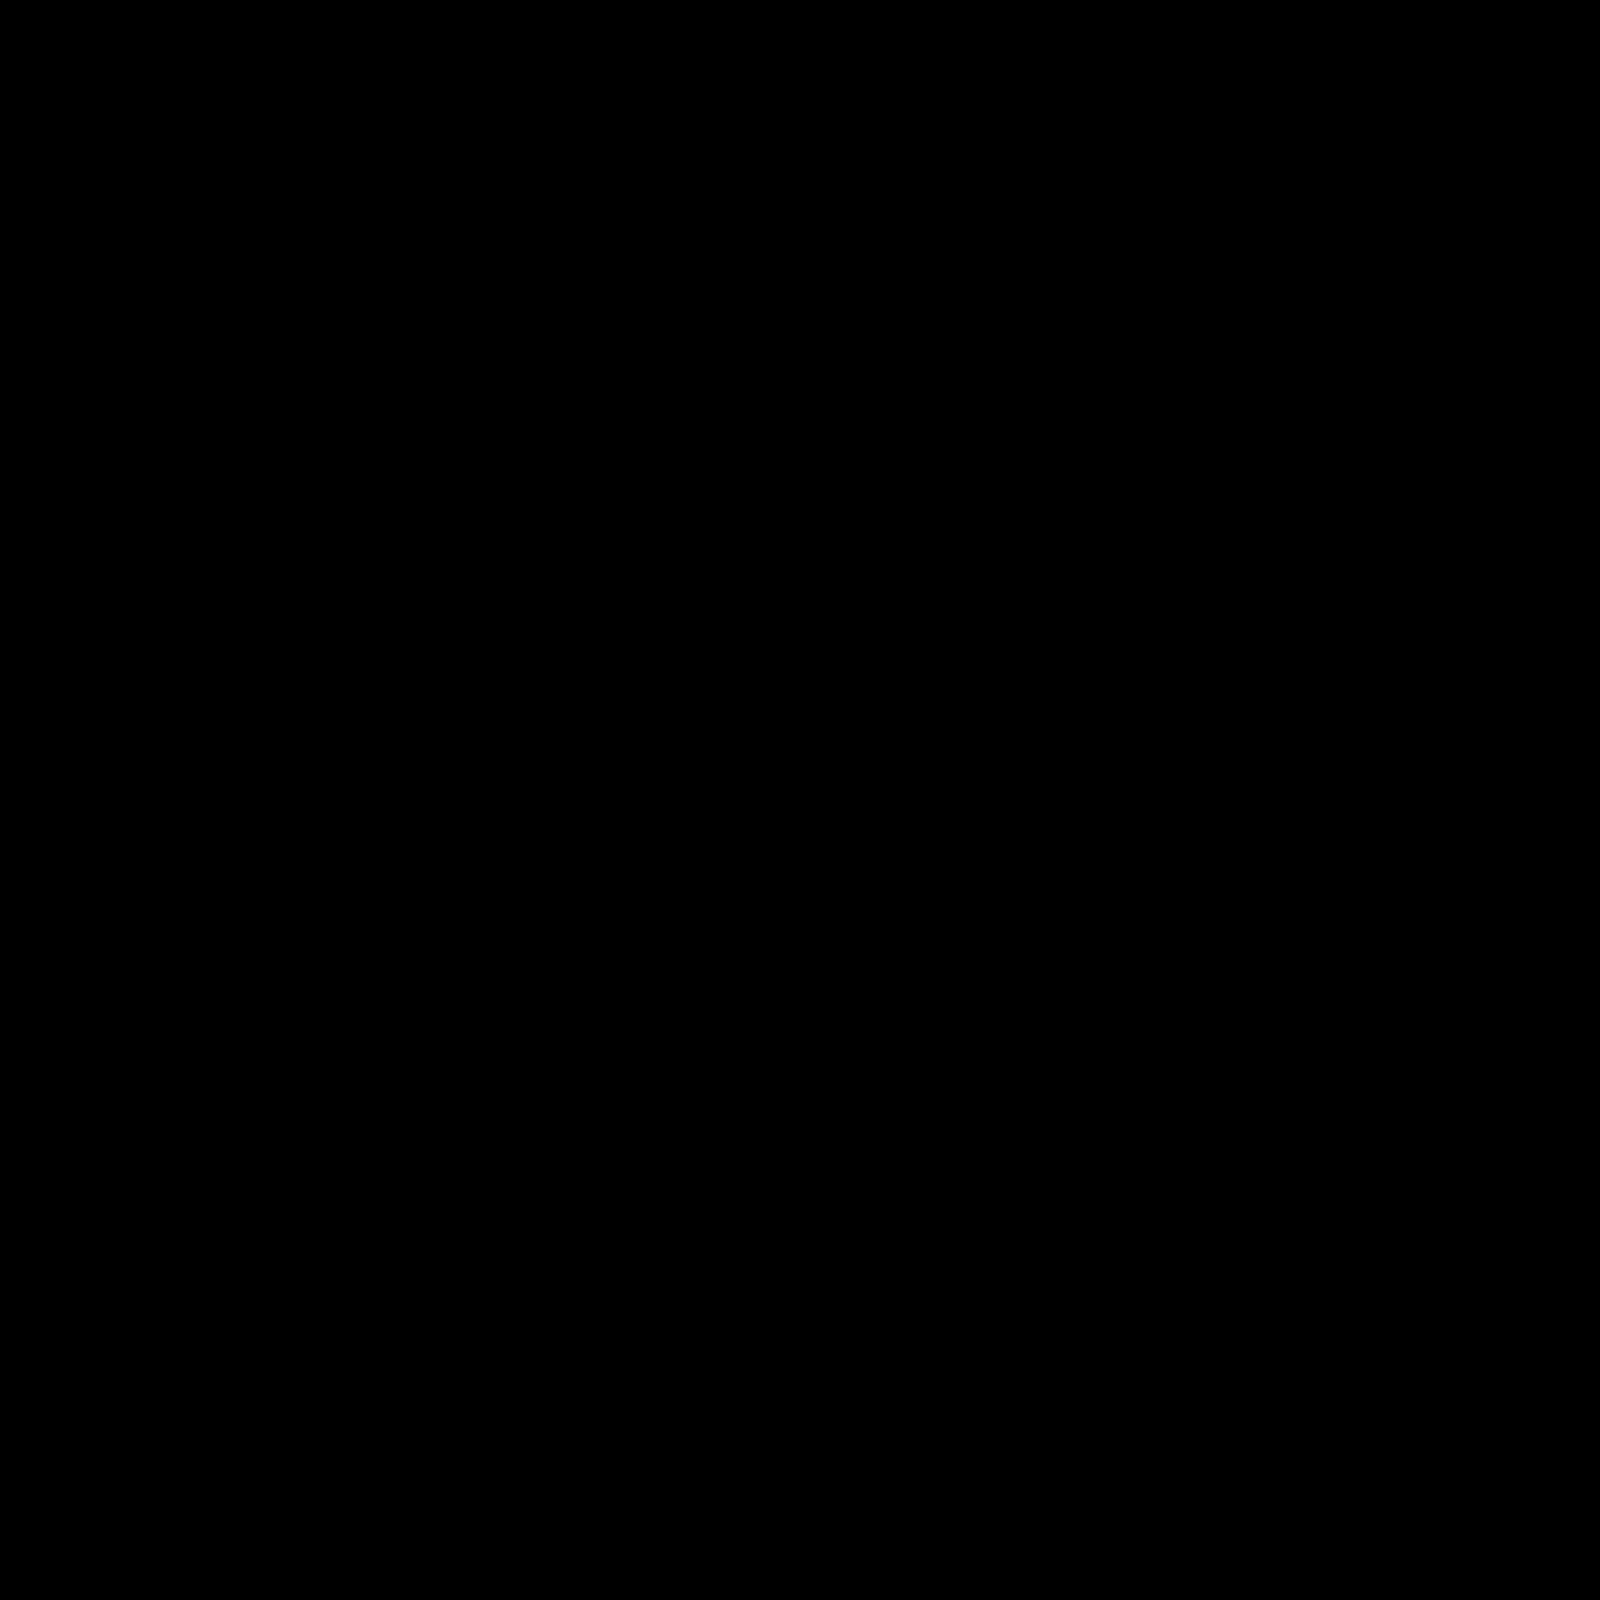 Inductive Distance Measurement icon